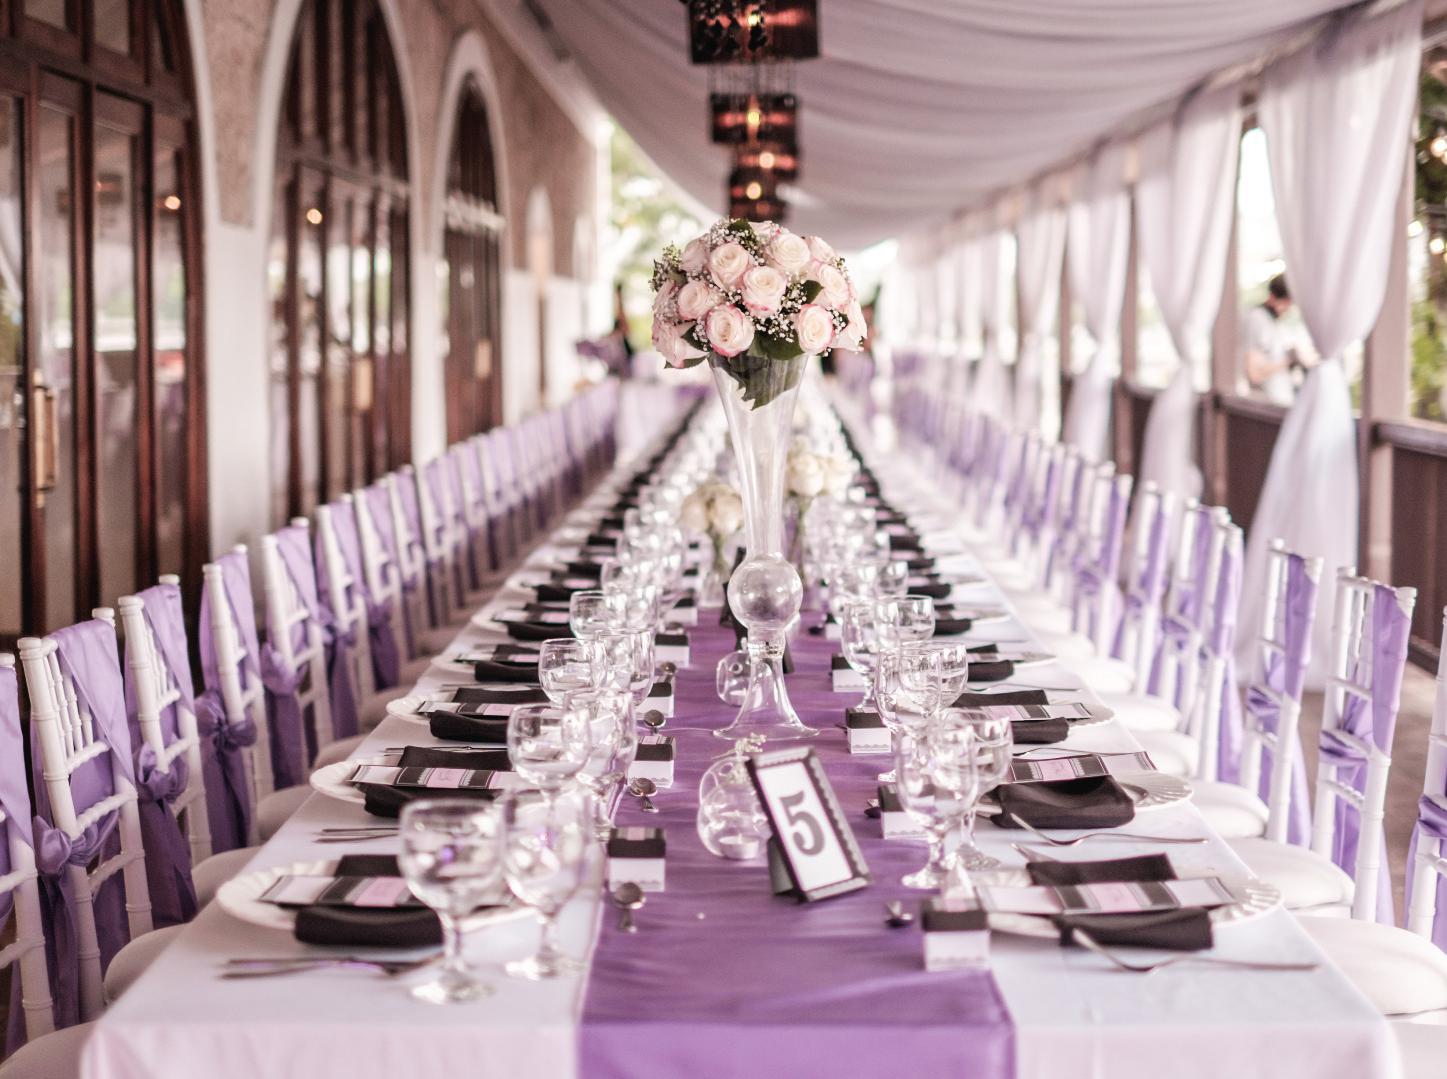 bodas-sin-clasificar-sin-tema-cuba-35642.jpg